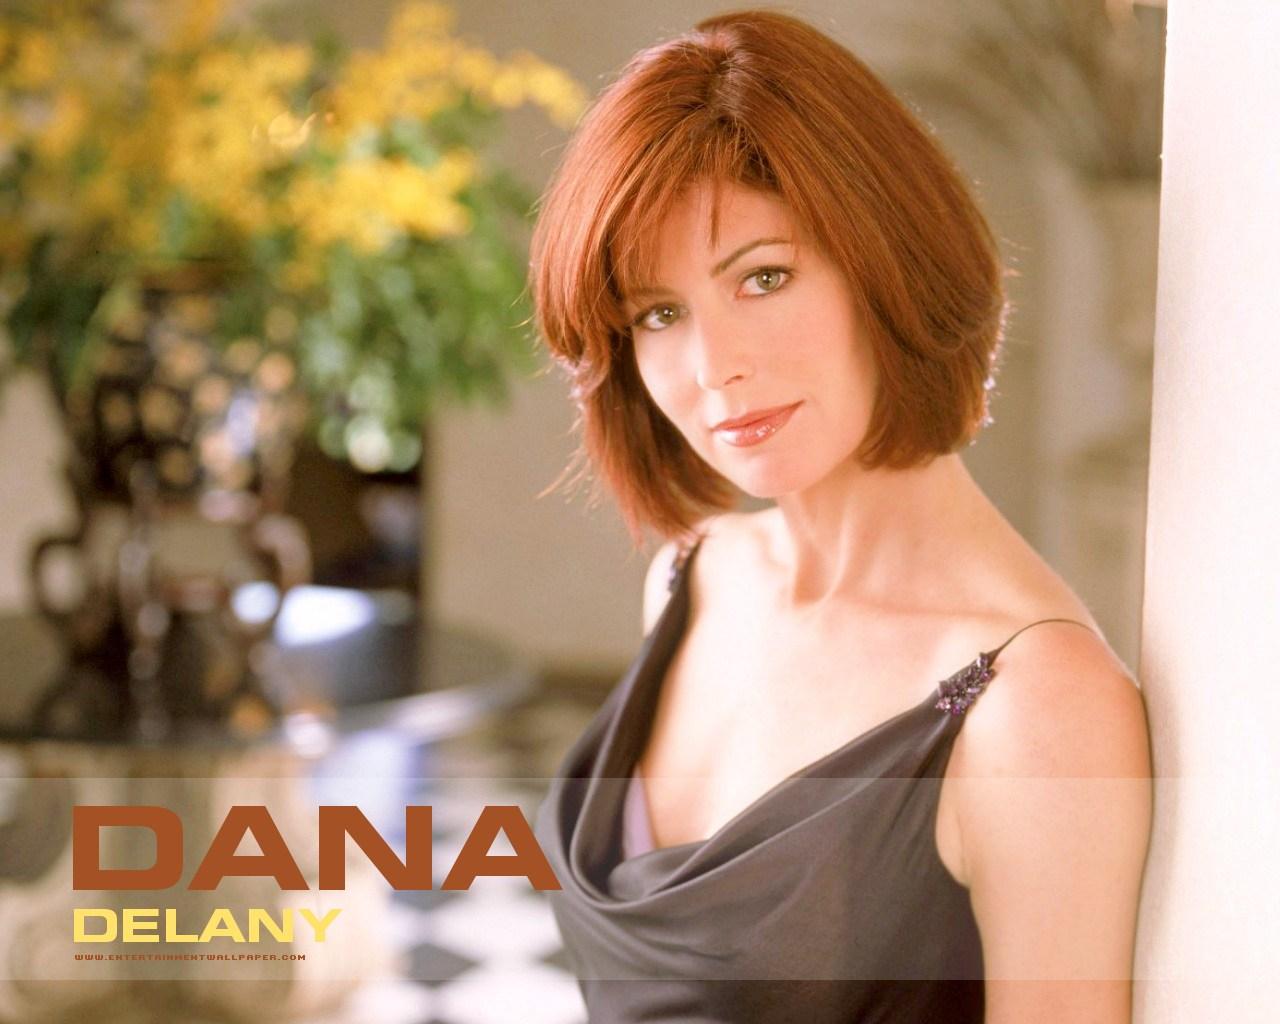 http://2.bp.blogspot.com/-Prmy9uwZoSM/UAJbrEYlV8I/AAAAAAAAAeY/FLq6T0HQGHs/s1600/Women+of....+Desperate+Housewives+Dana+Delany.jpg